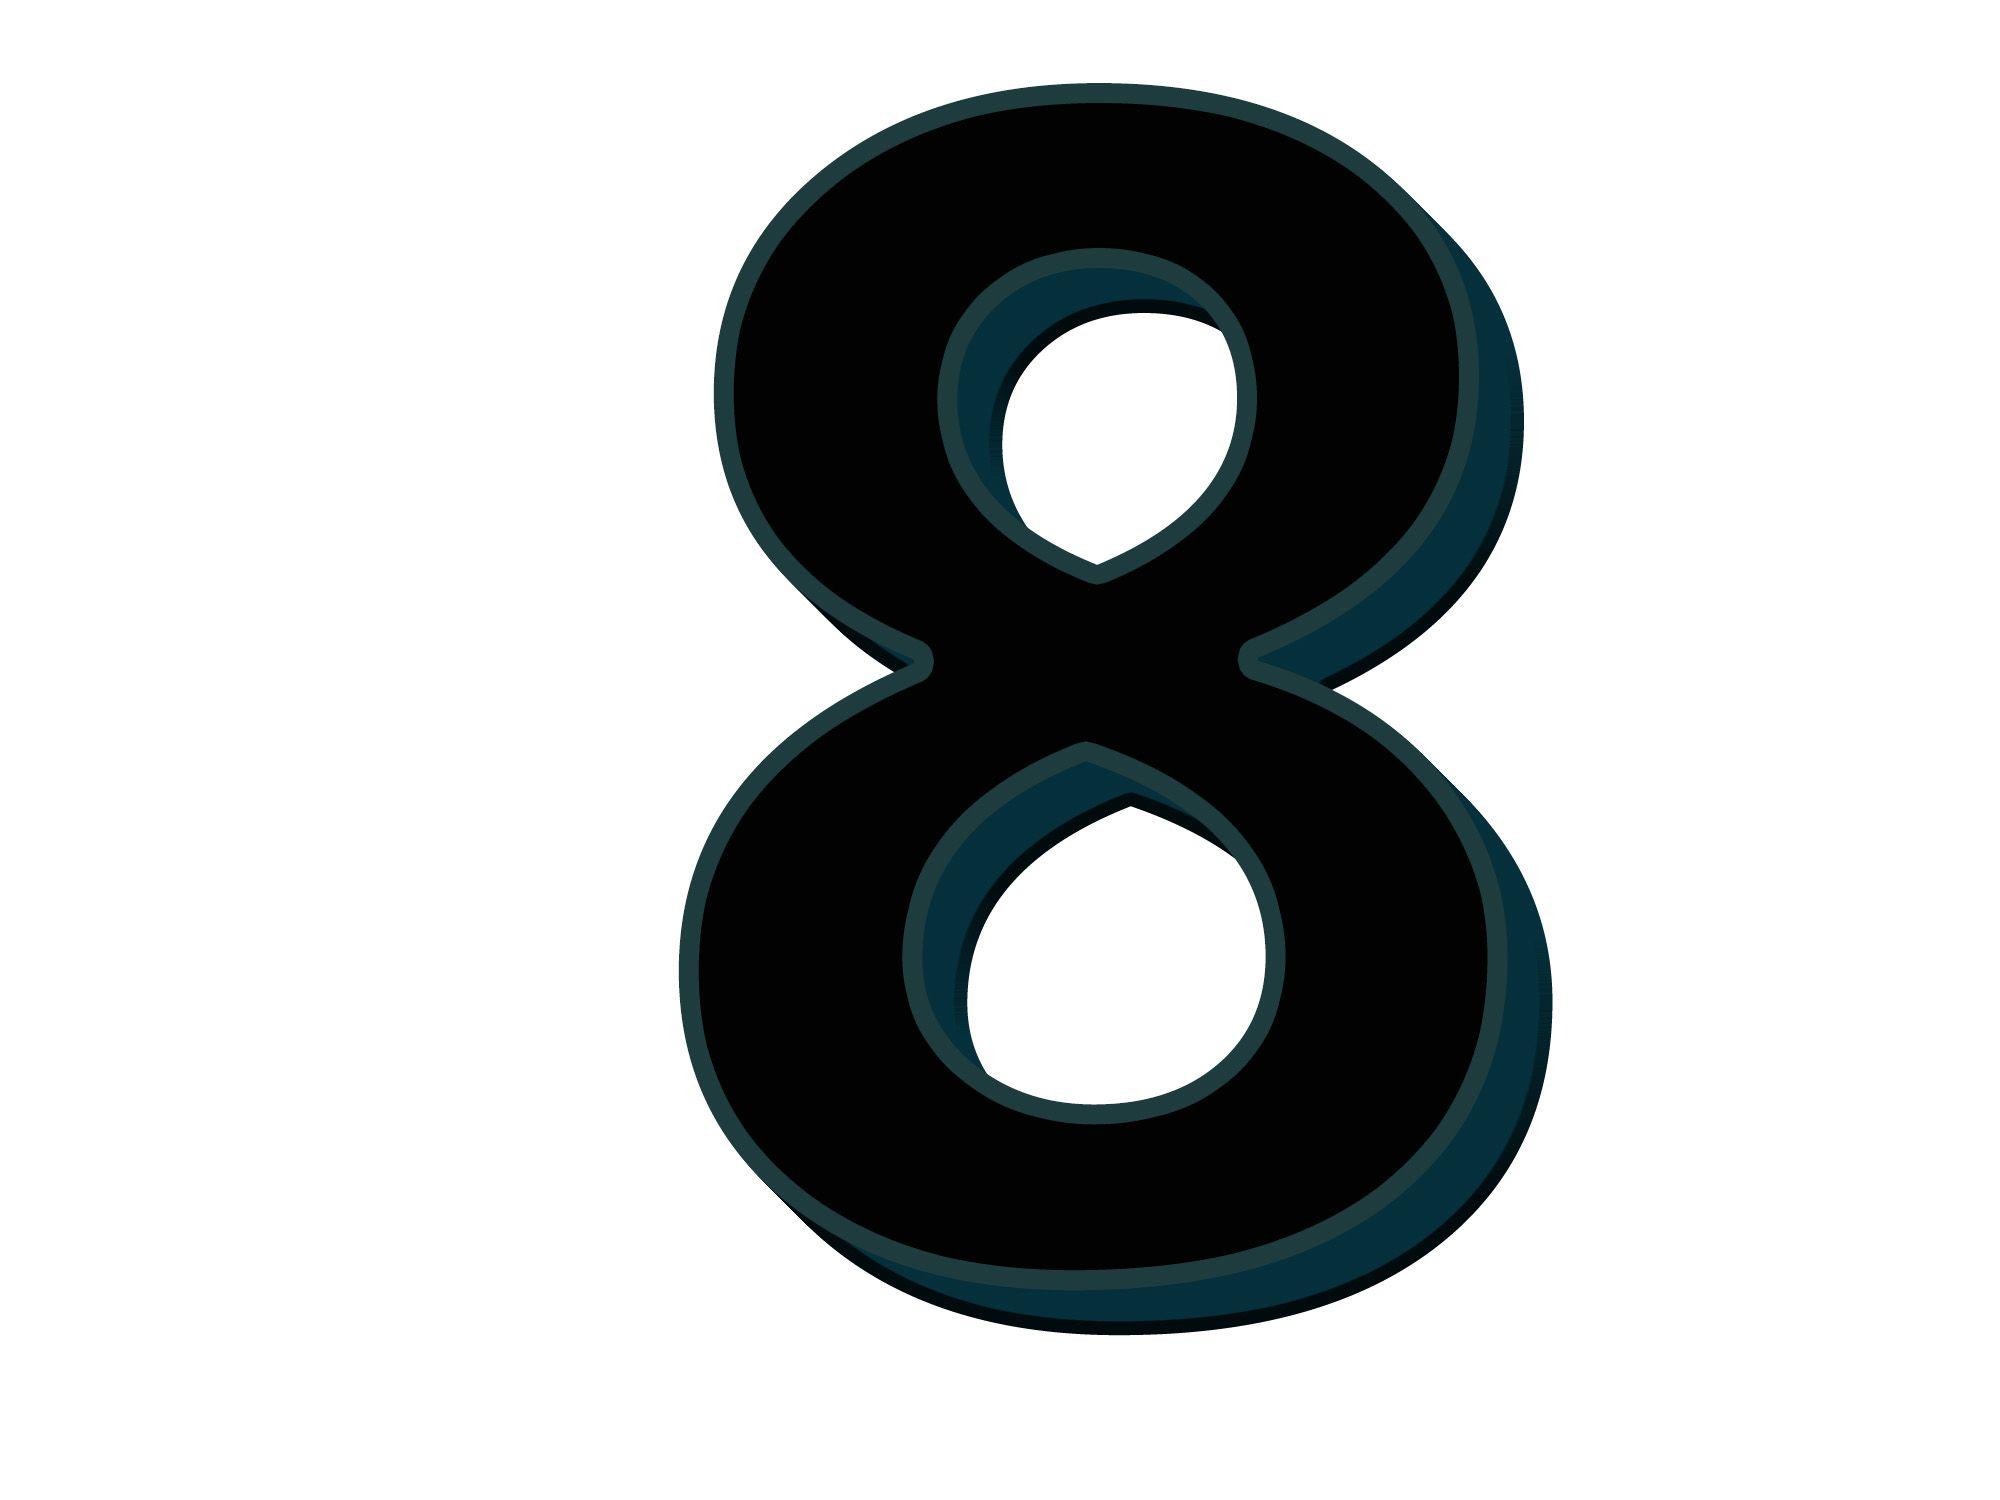 Radix Number 8